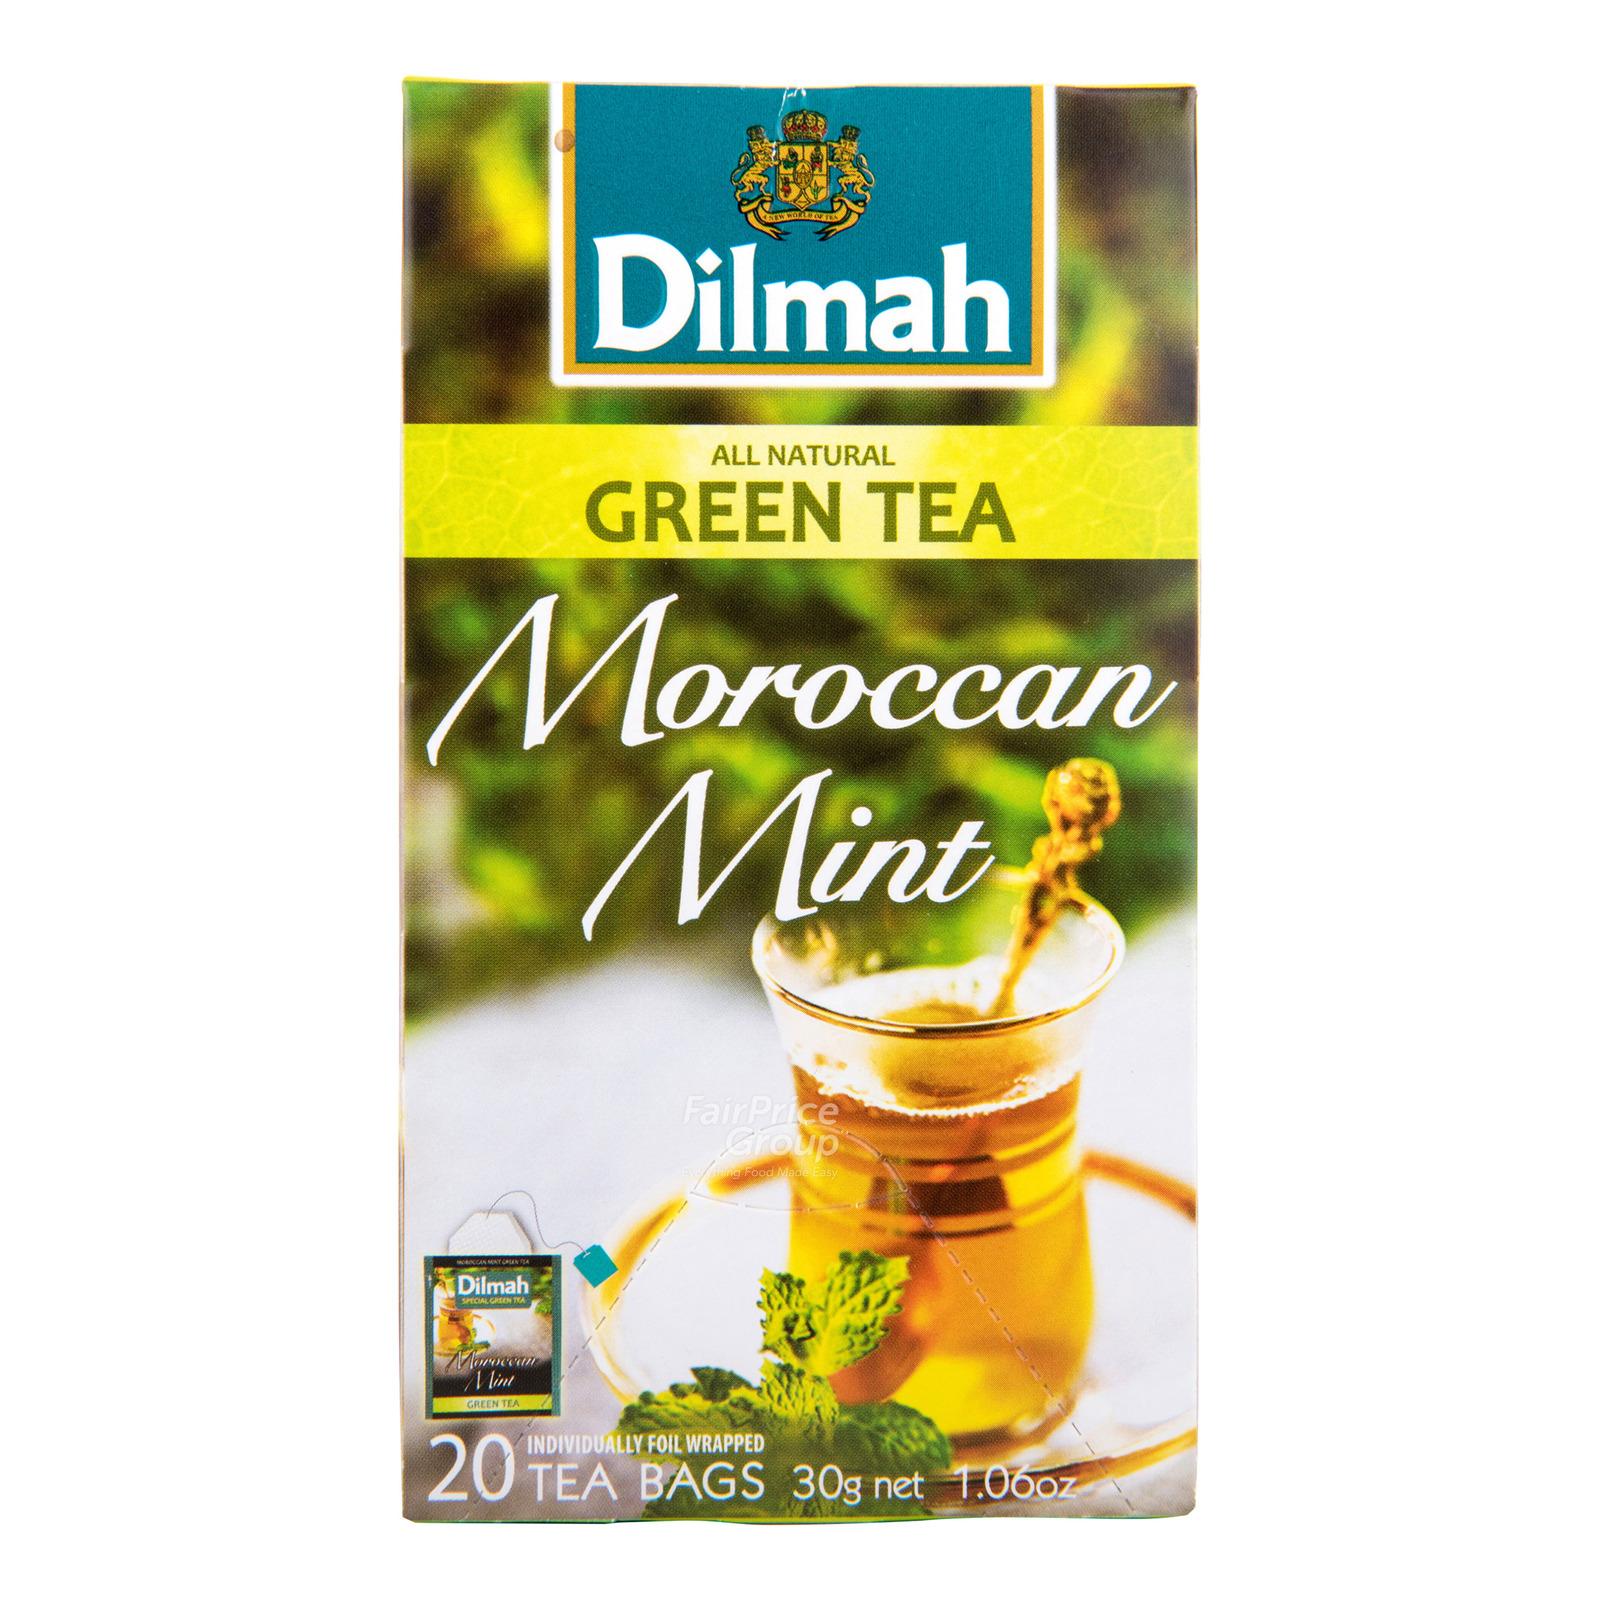 Dilmah Pure Ceylon Tea Bags - Moroccan Mint (Green Tea)